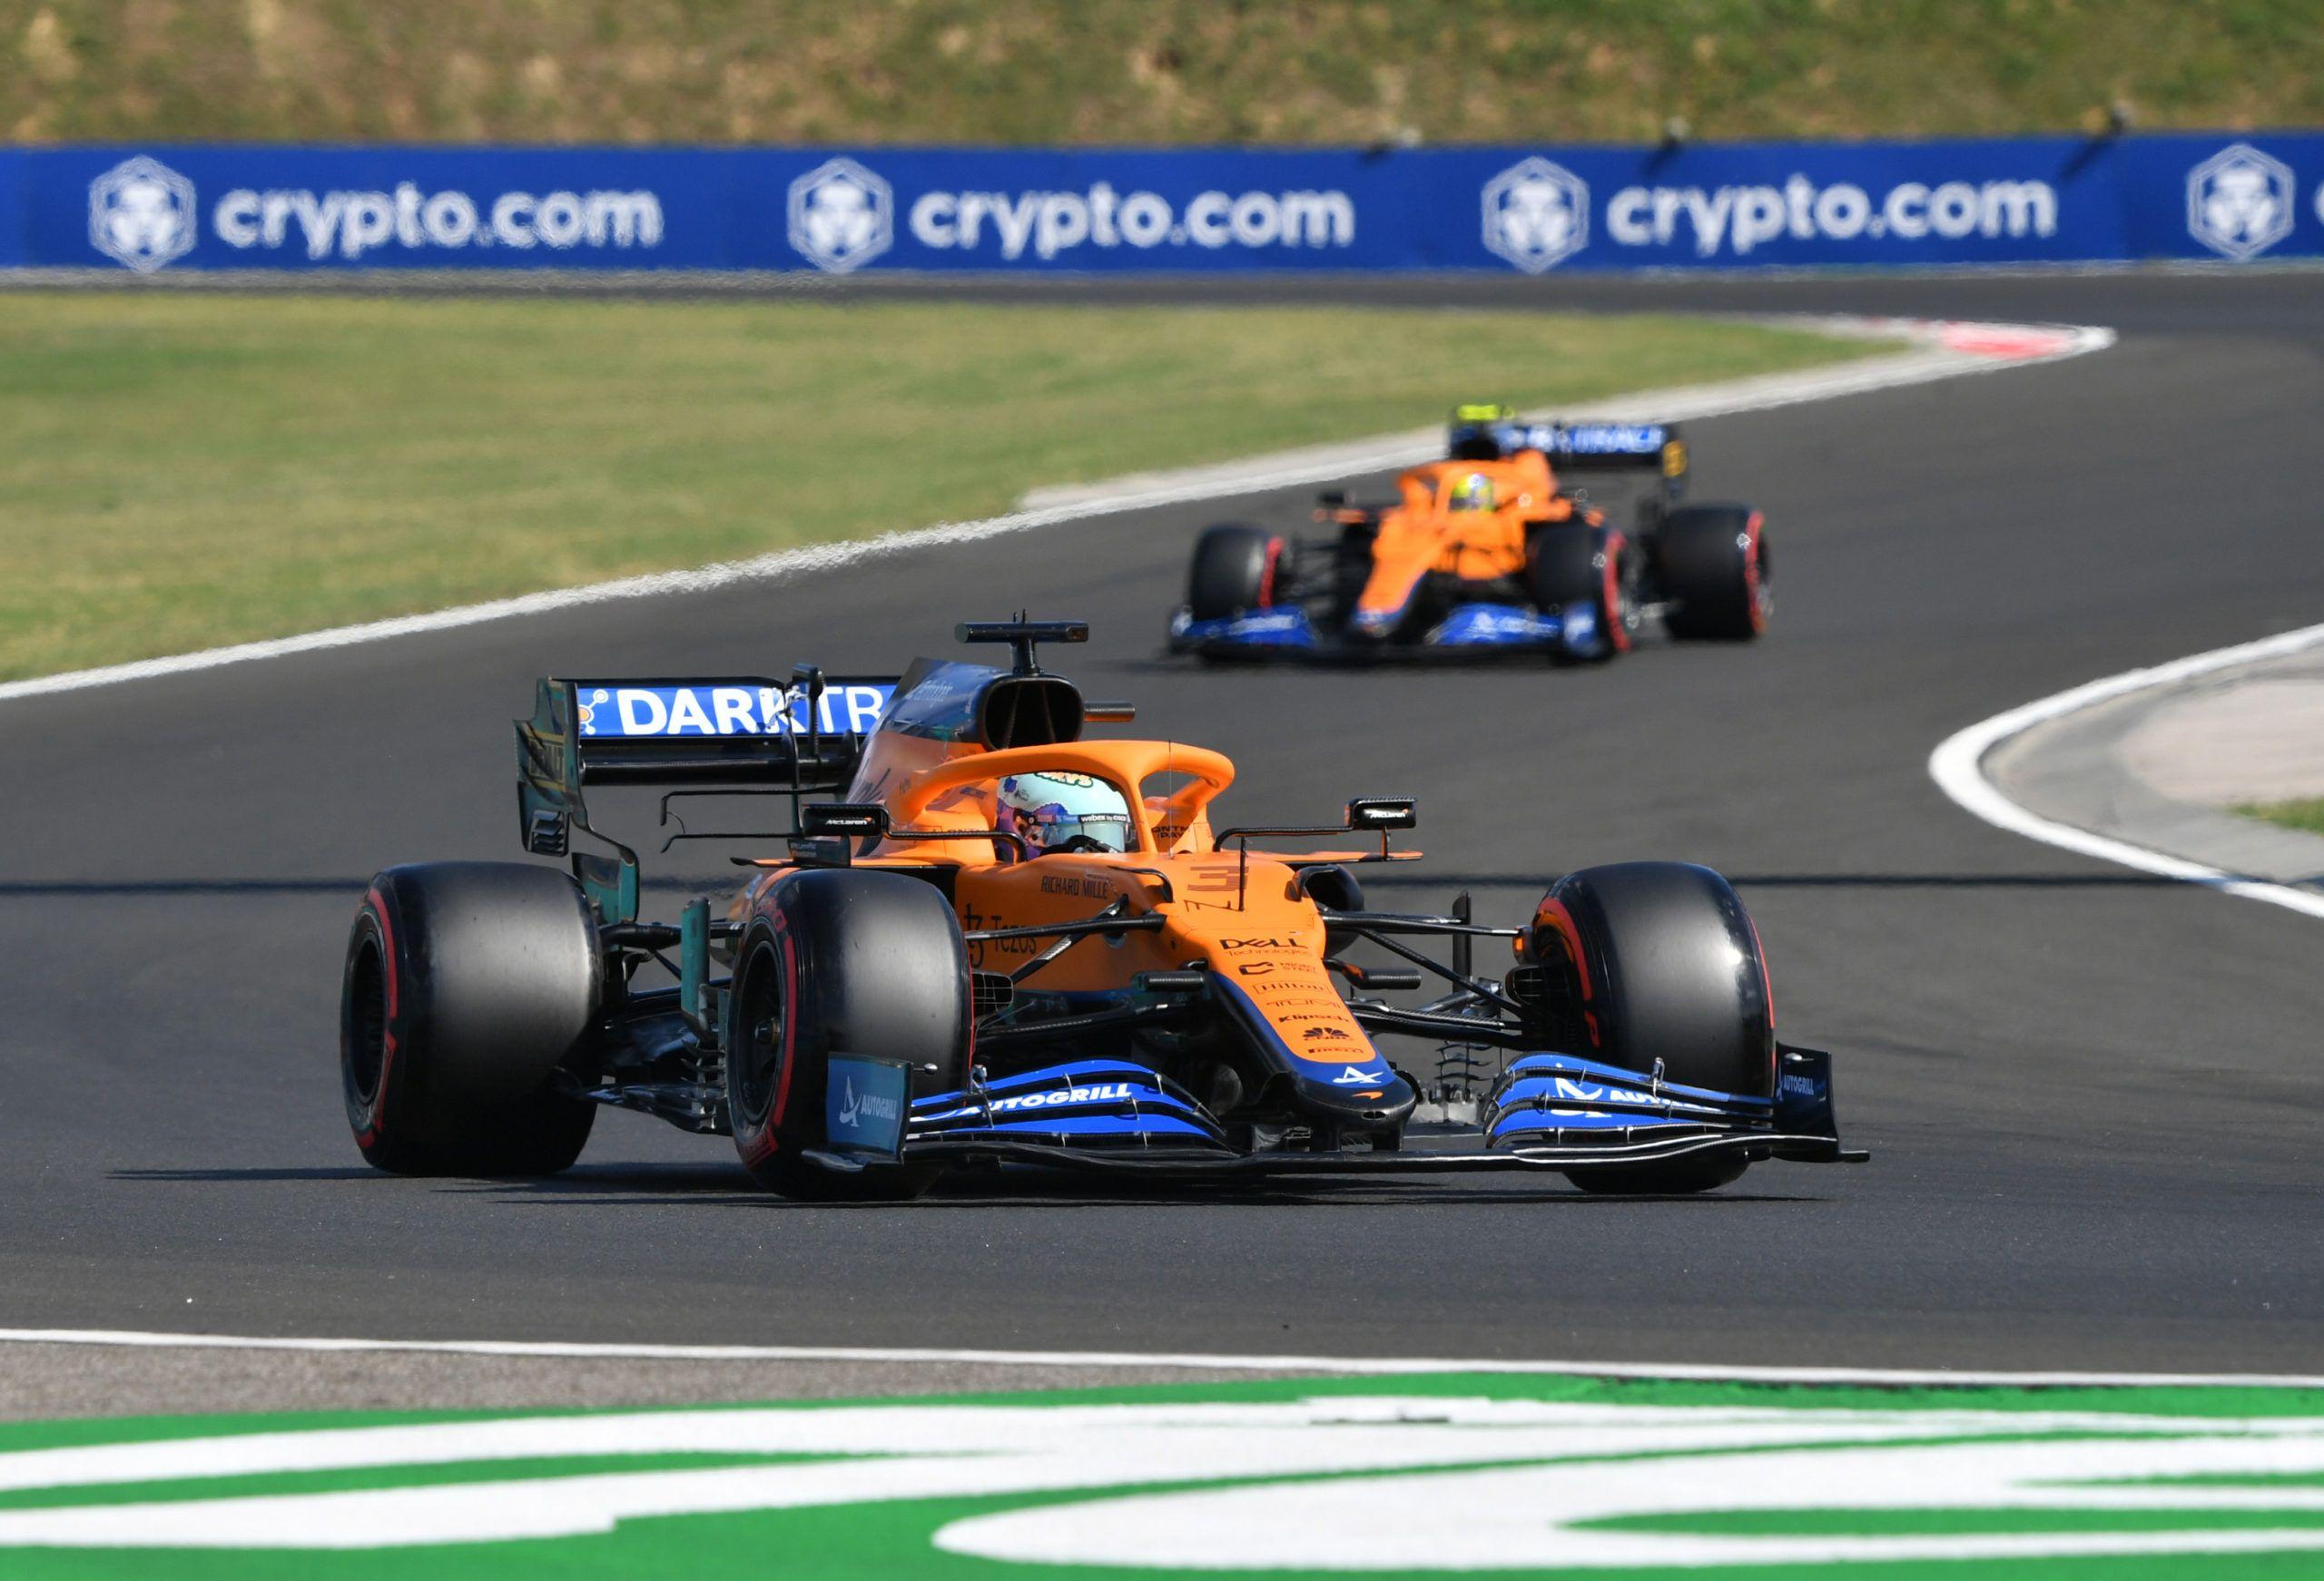 Andrea Stella, McLaren, F1